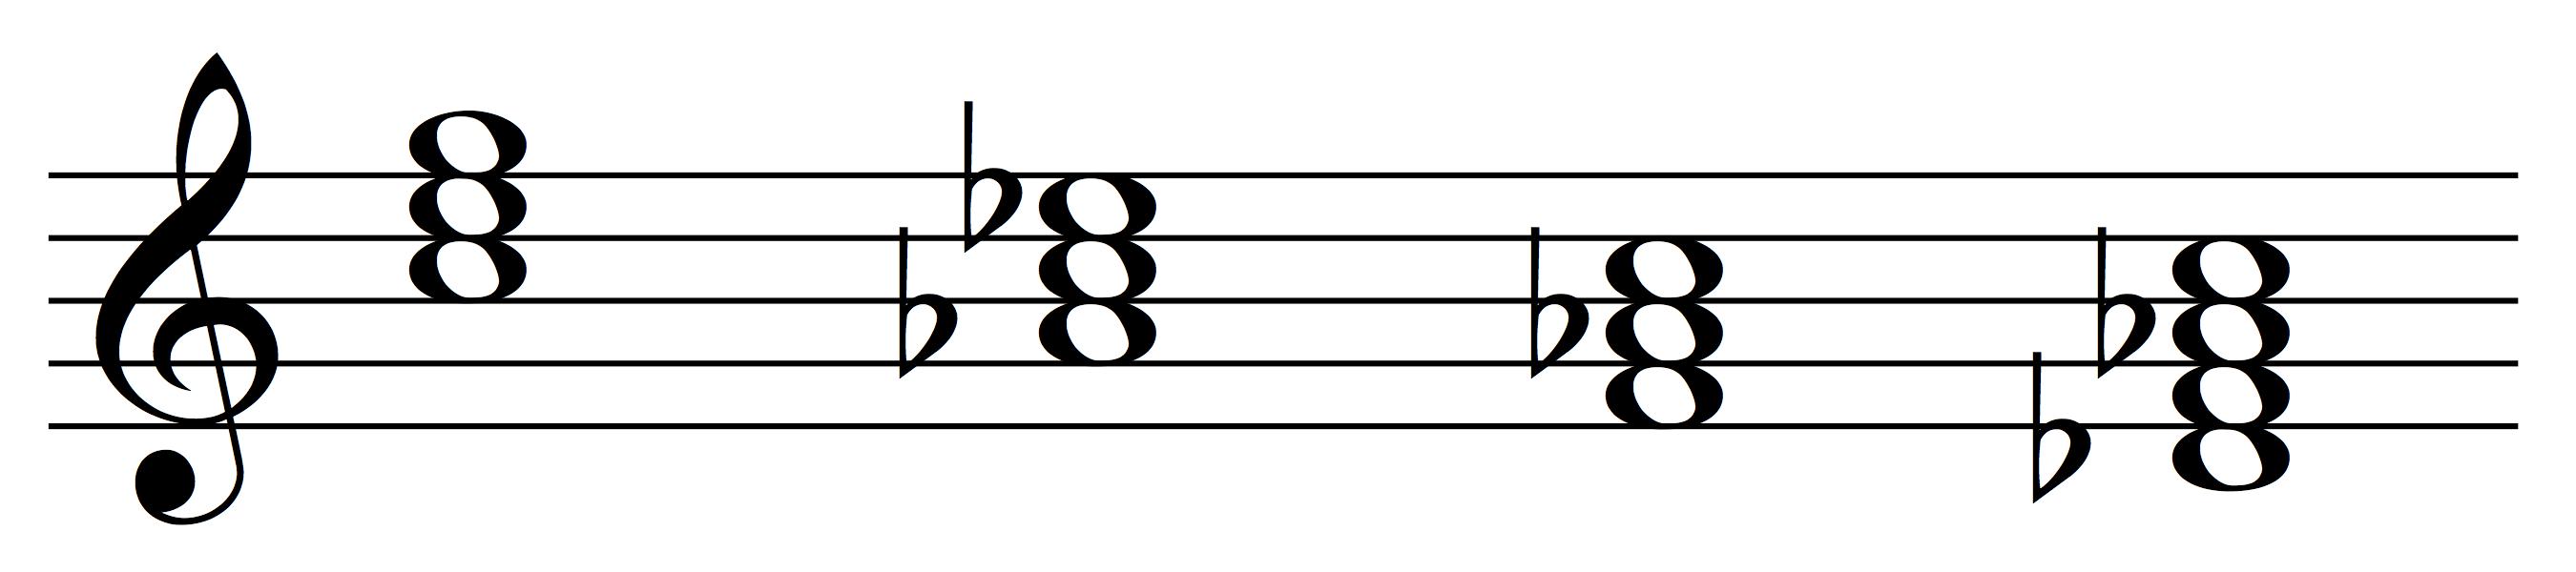 Progression with common tone C